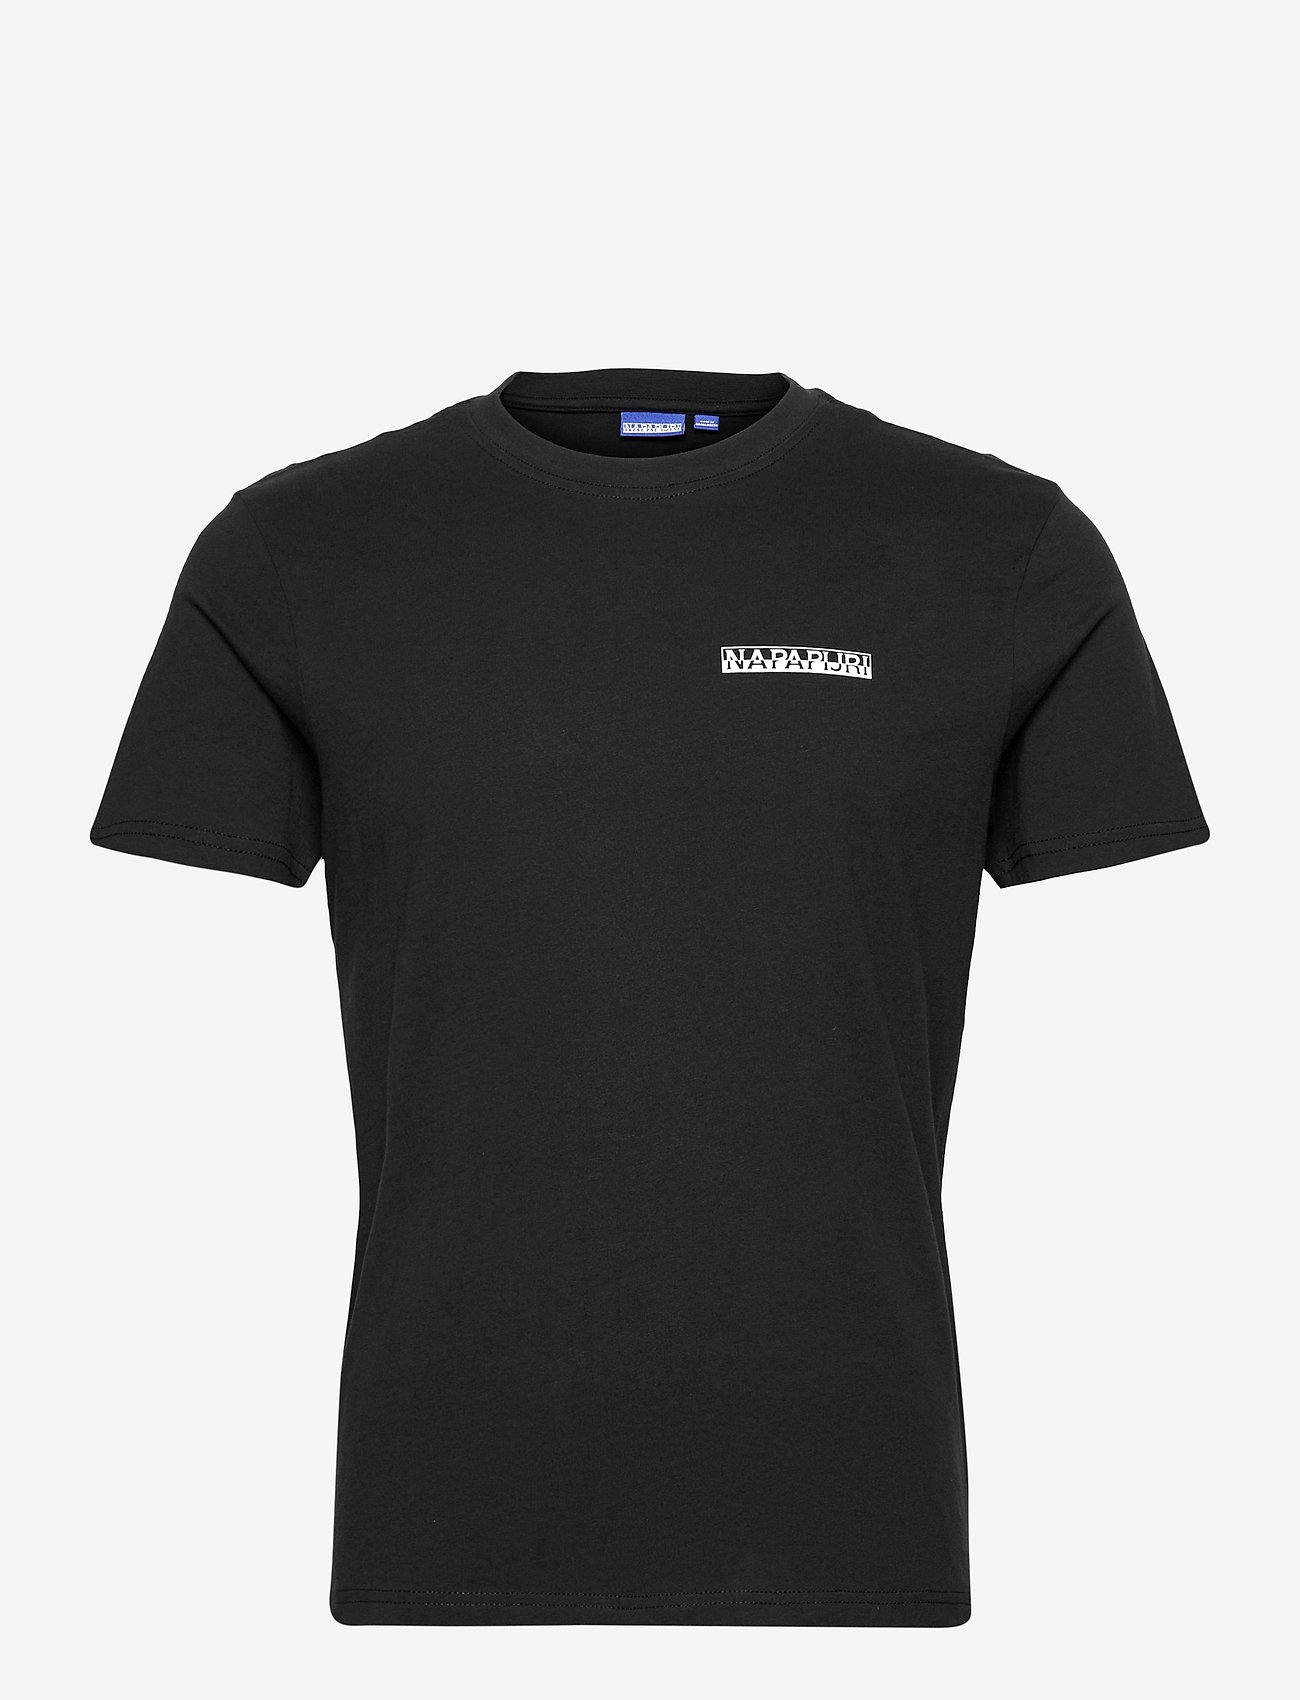 Napapijri - S-SURF SS - podstawowe koszulki - black - 0